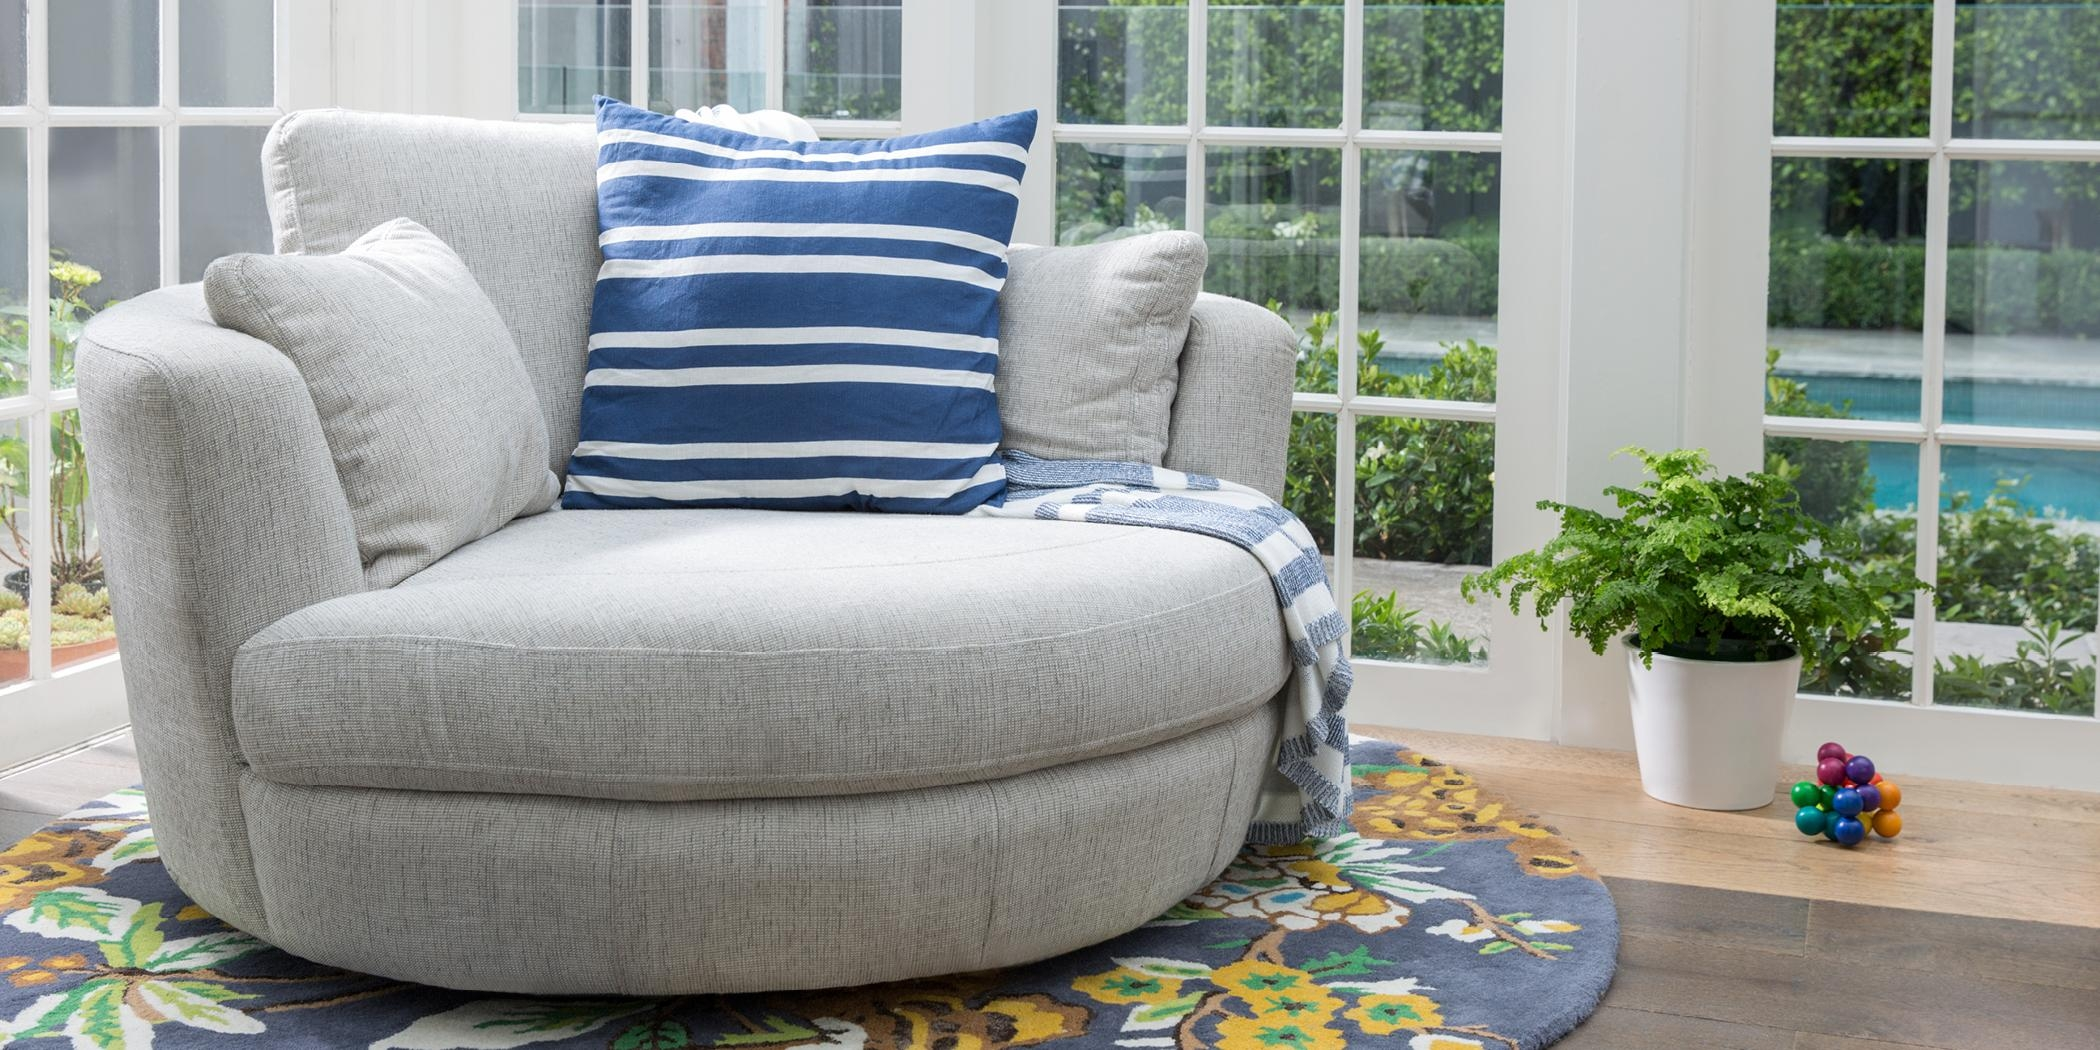 Trendy Round Swivel Sofa Chair L157 Alba Modern Leather Lounge Dsc Inside Round Swivel Sofa Chairs (Image 20 of 20)